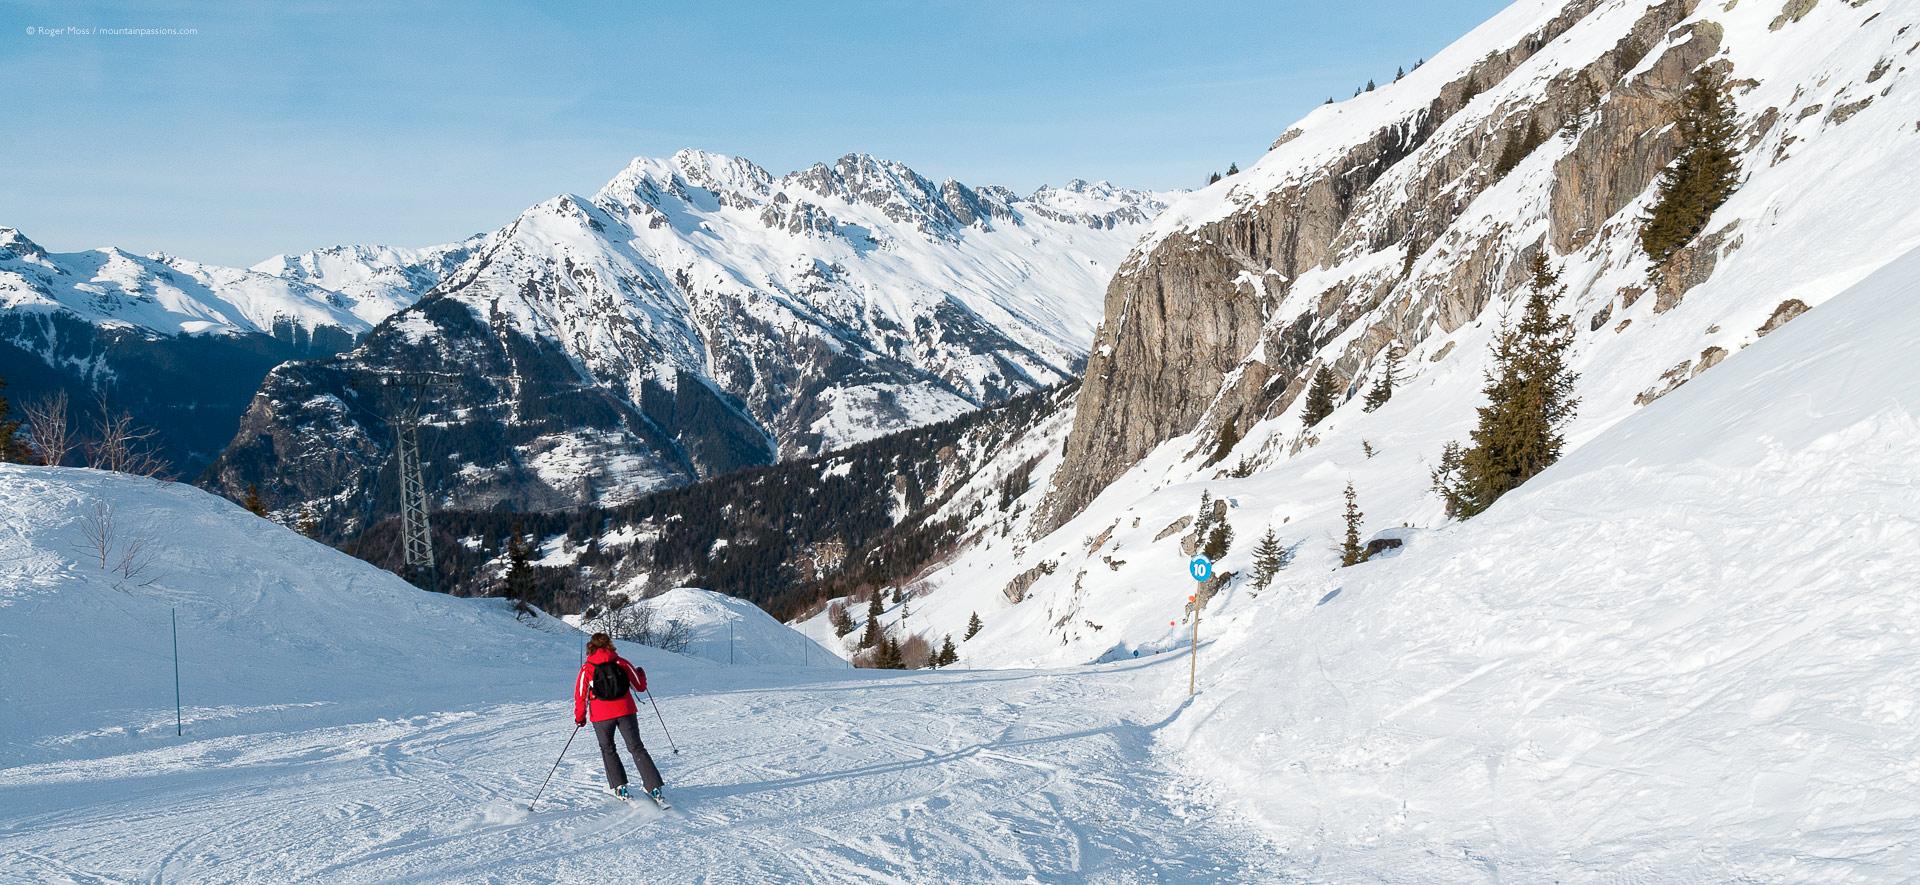 Skier descending piste between rocky outcrops